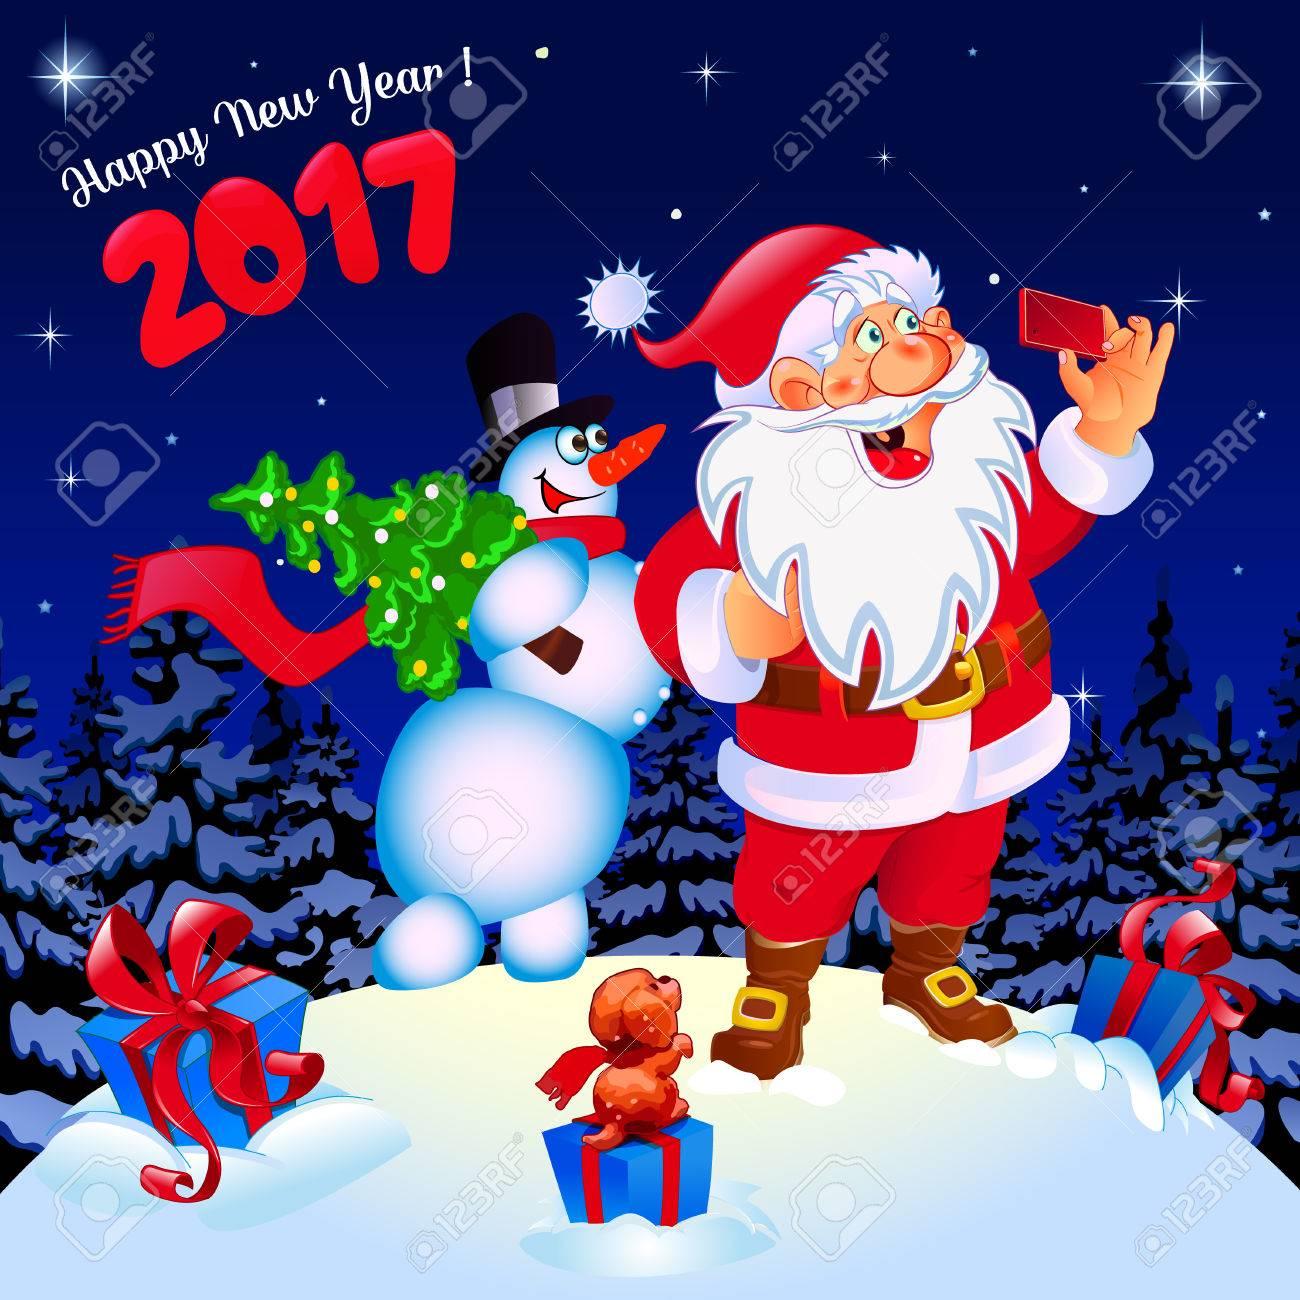 happy new year congratulation santa and snowman making selfie gifts color blue - Santa And Snowman